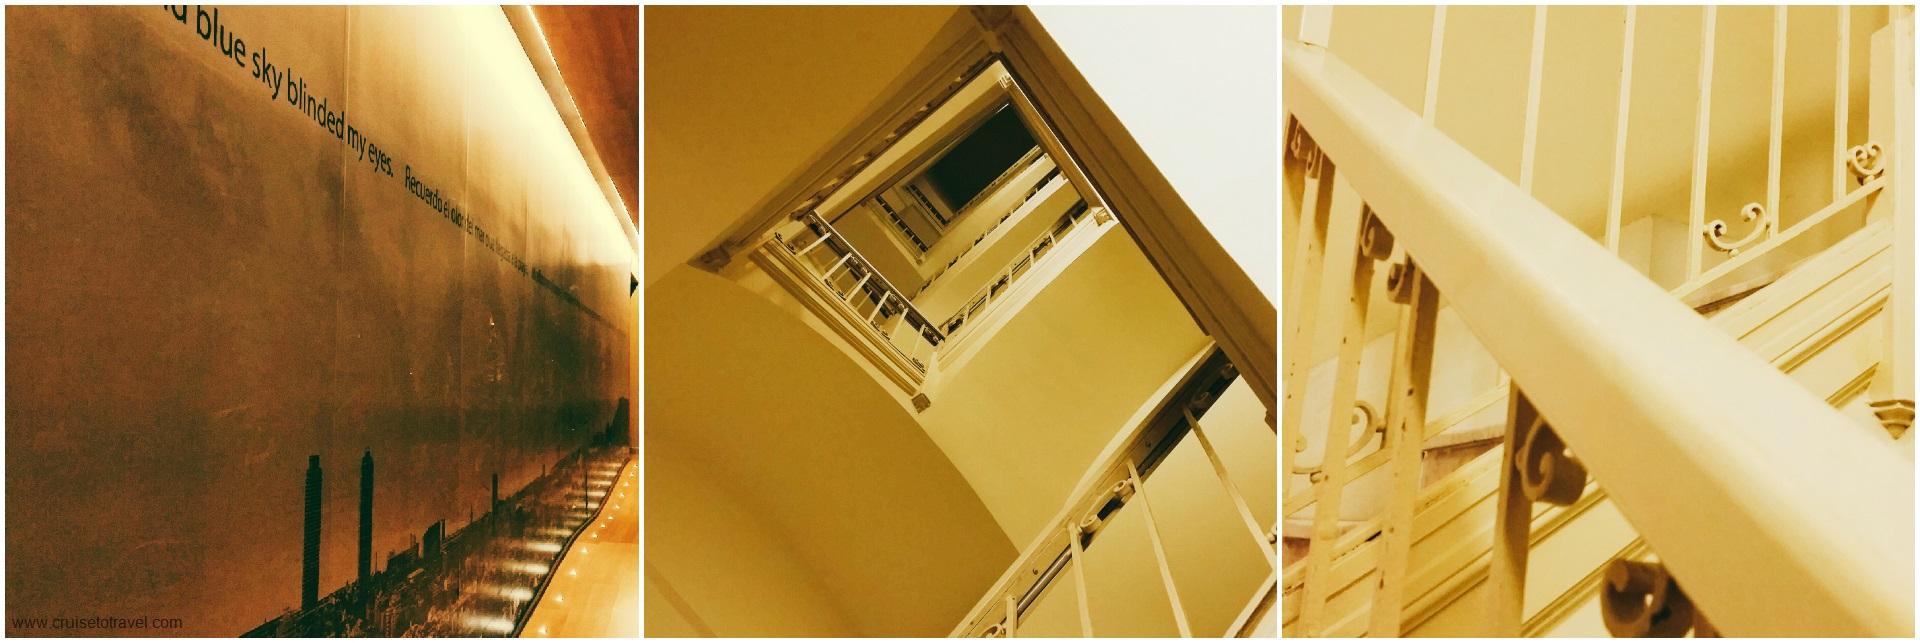 bcn hotel3